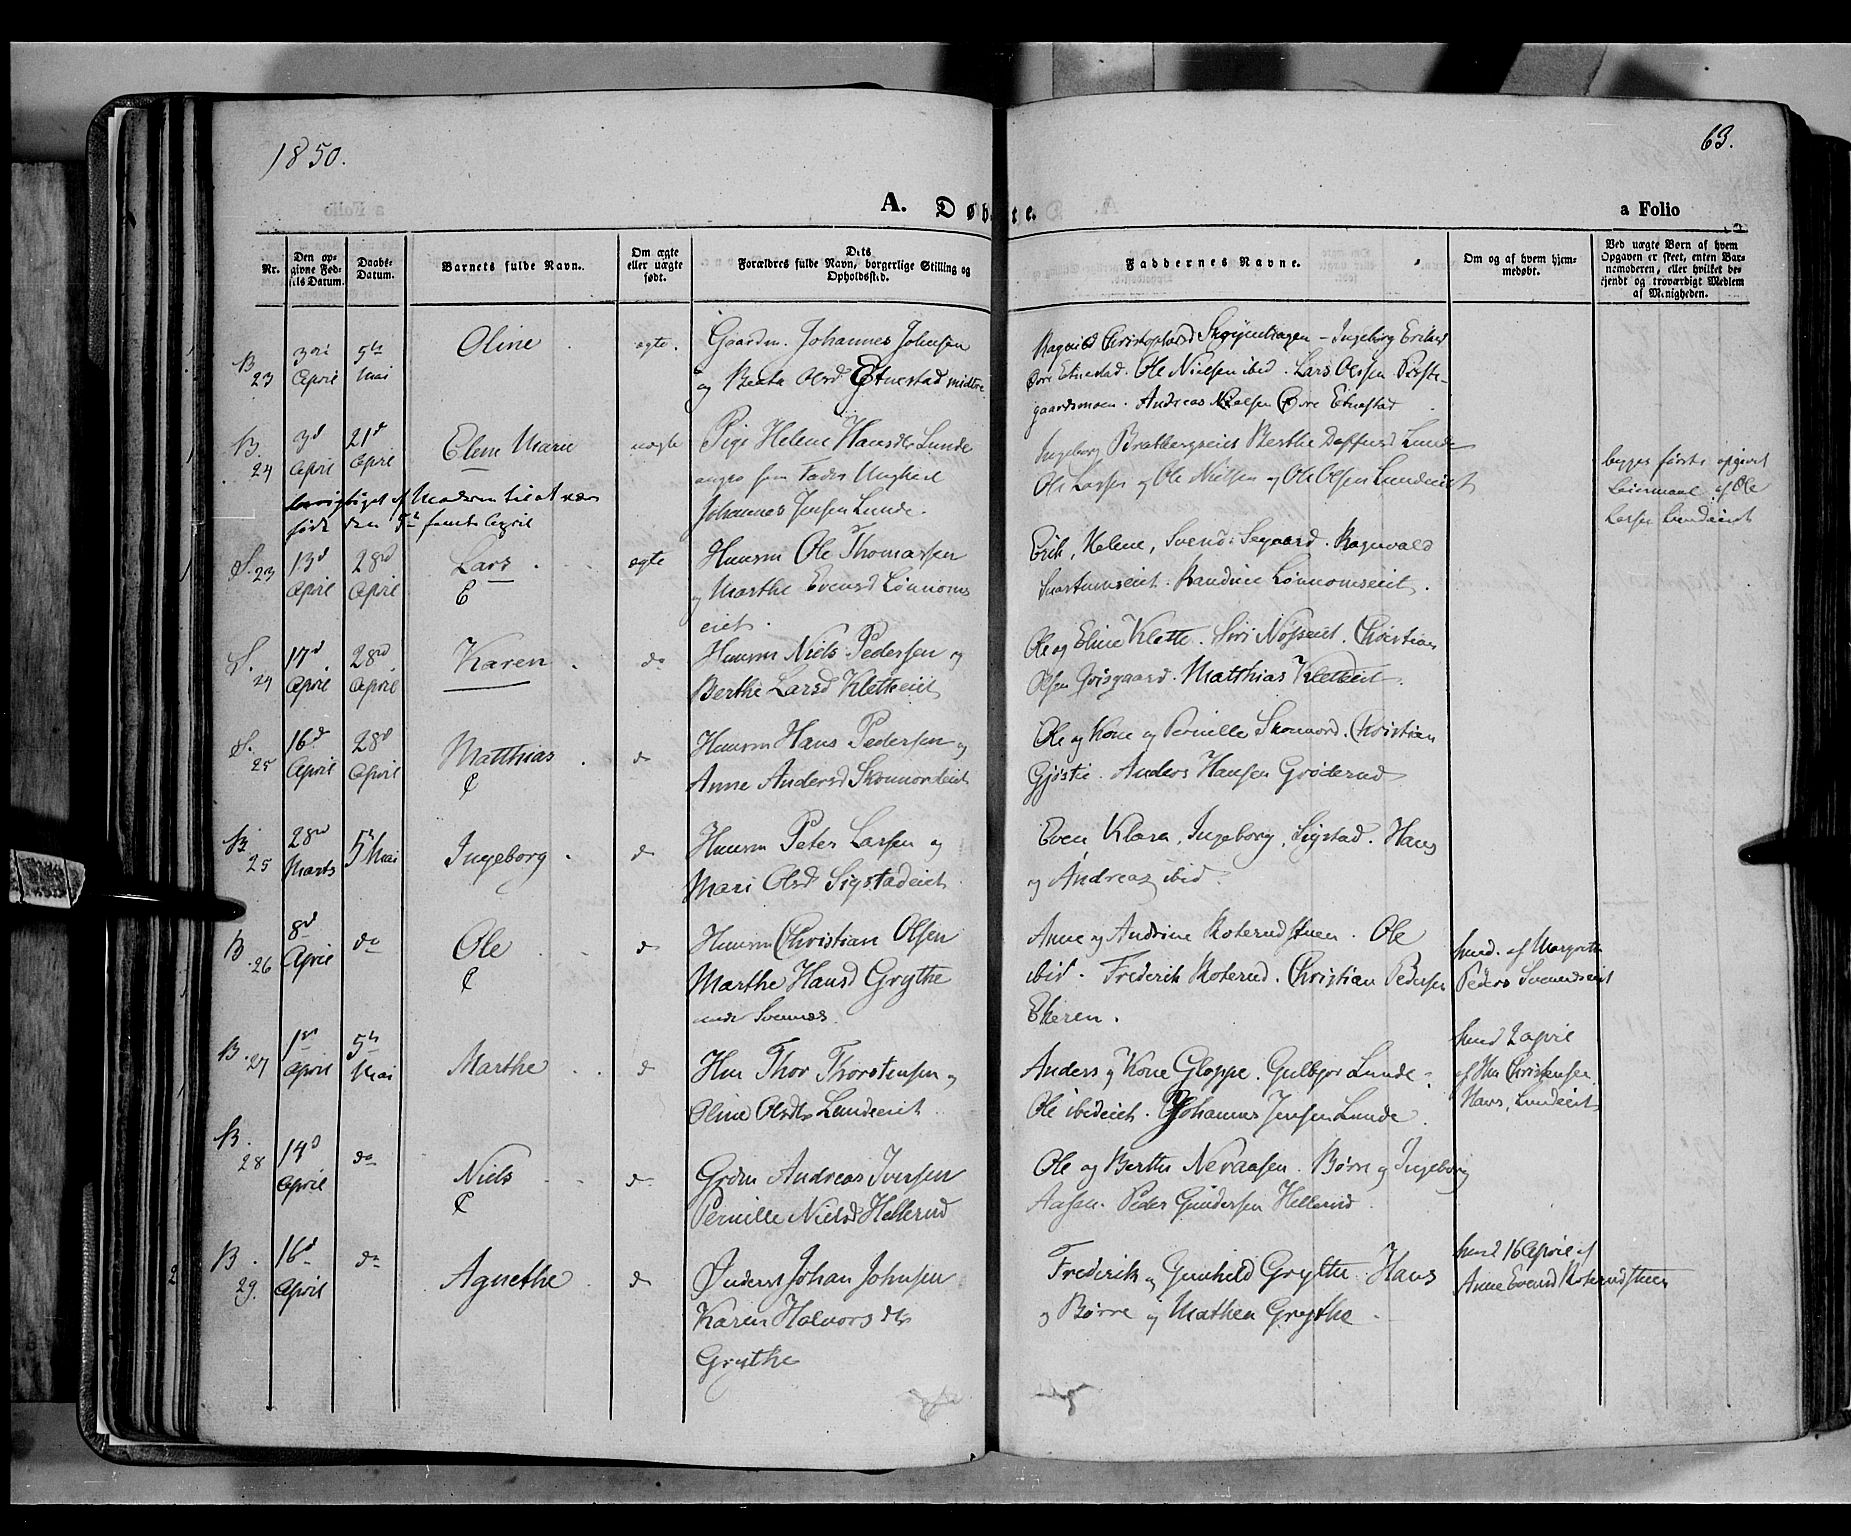 SAH, Biri prestekontor, Parish register (official) no. 5, 1843-1854, p. 63